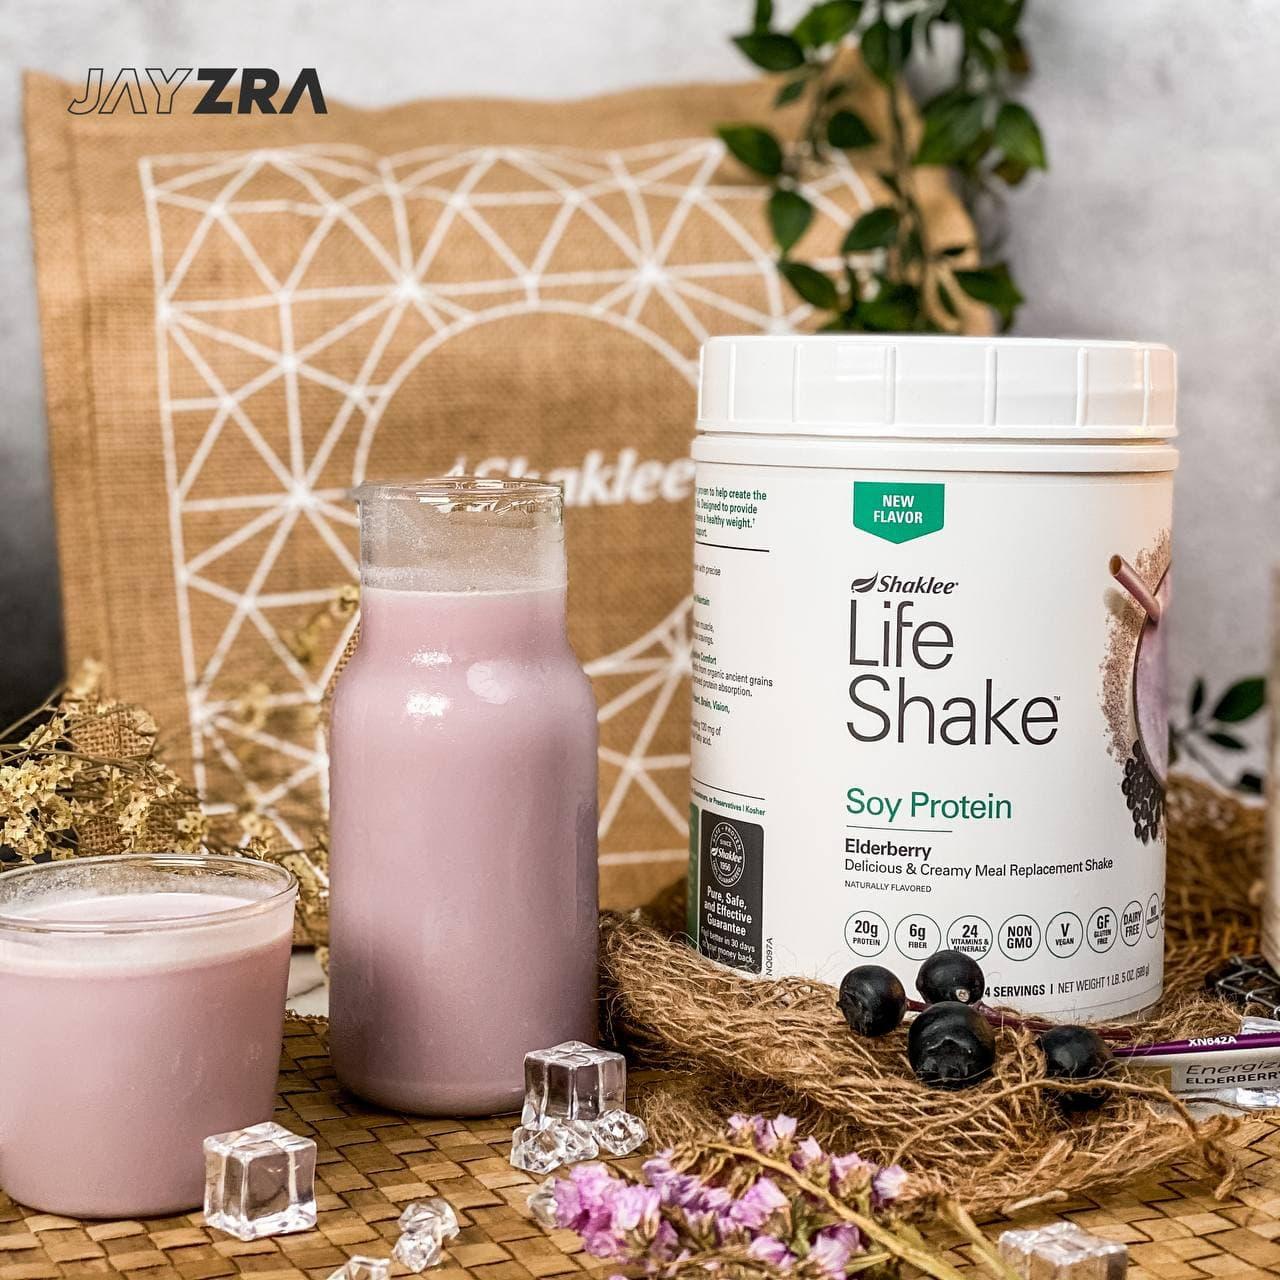 Kebaikan Life Shake Elderberry Shaklee